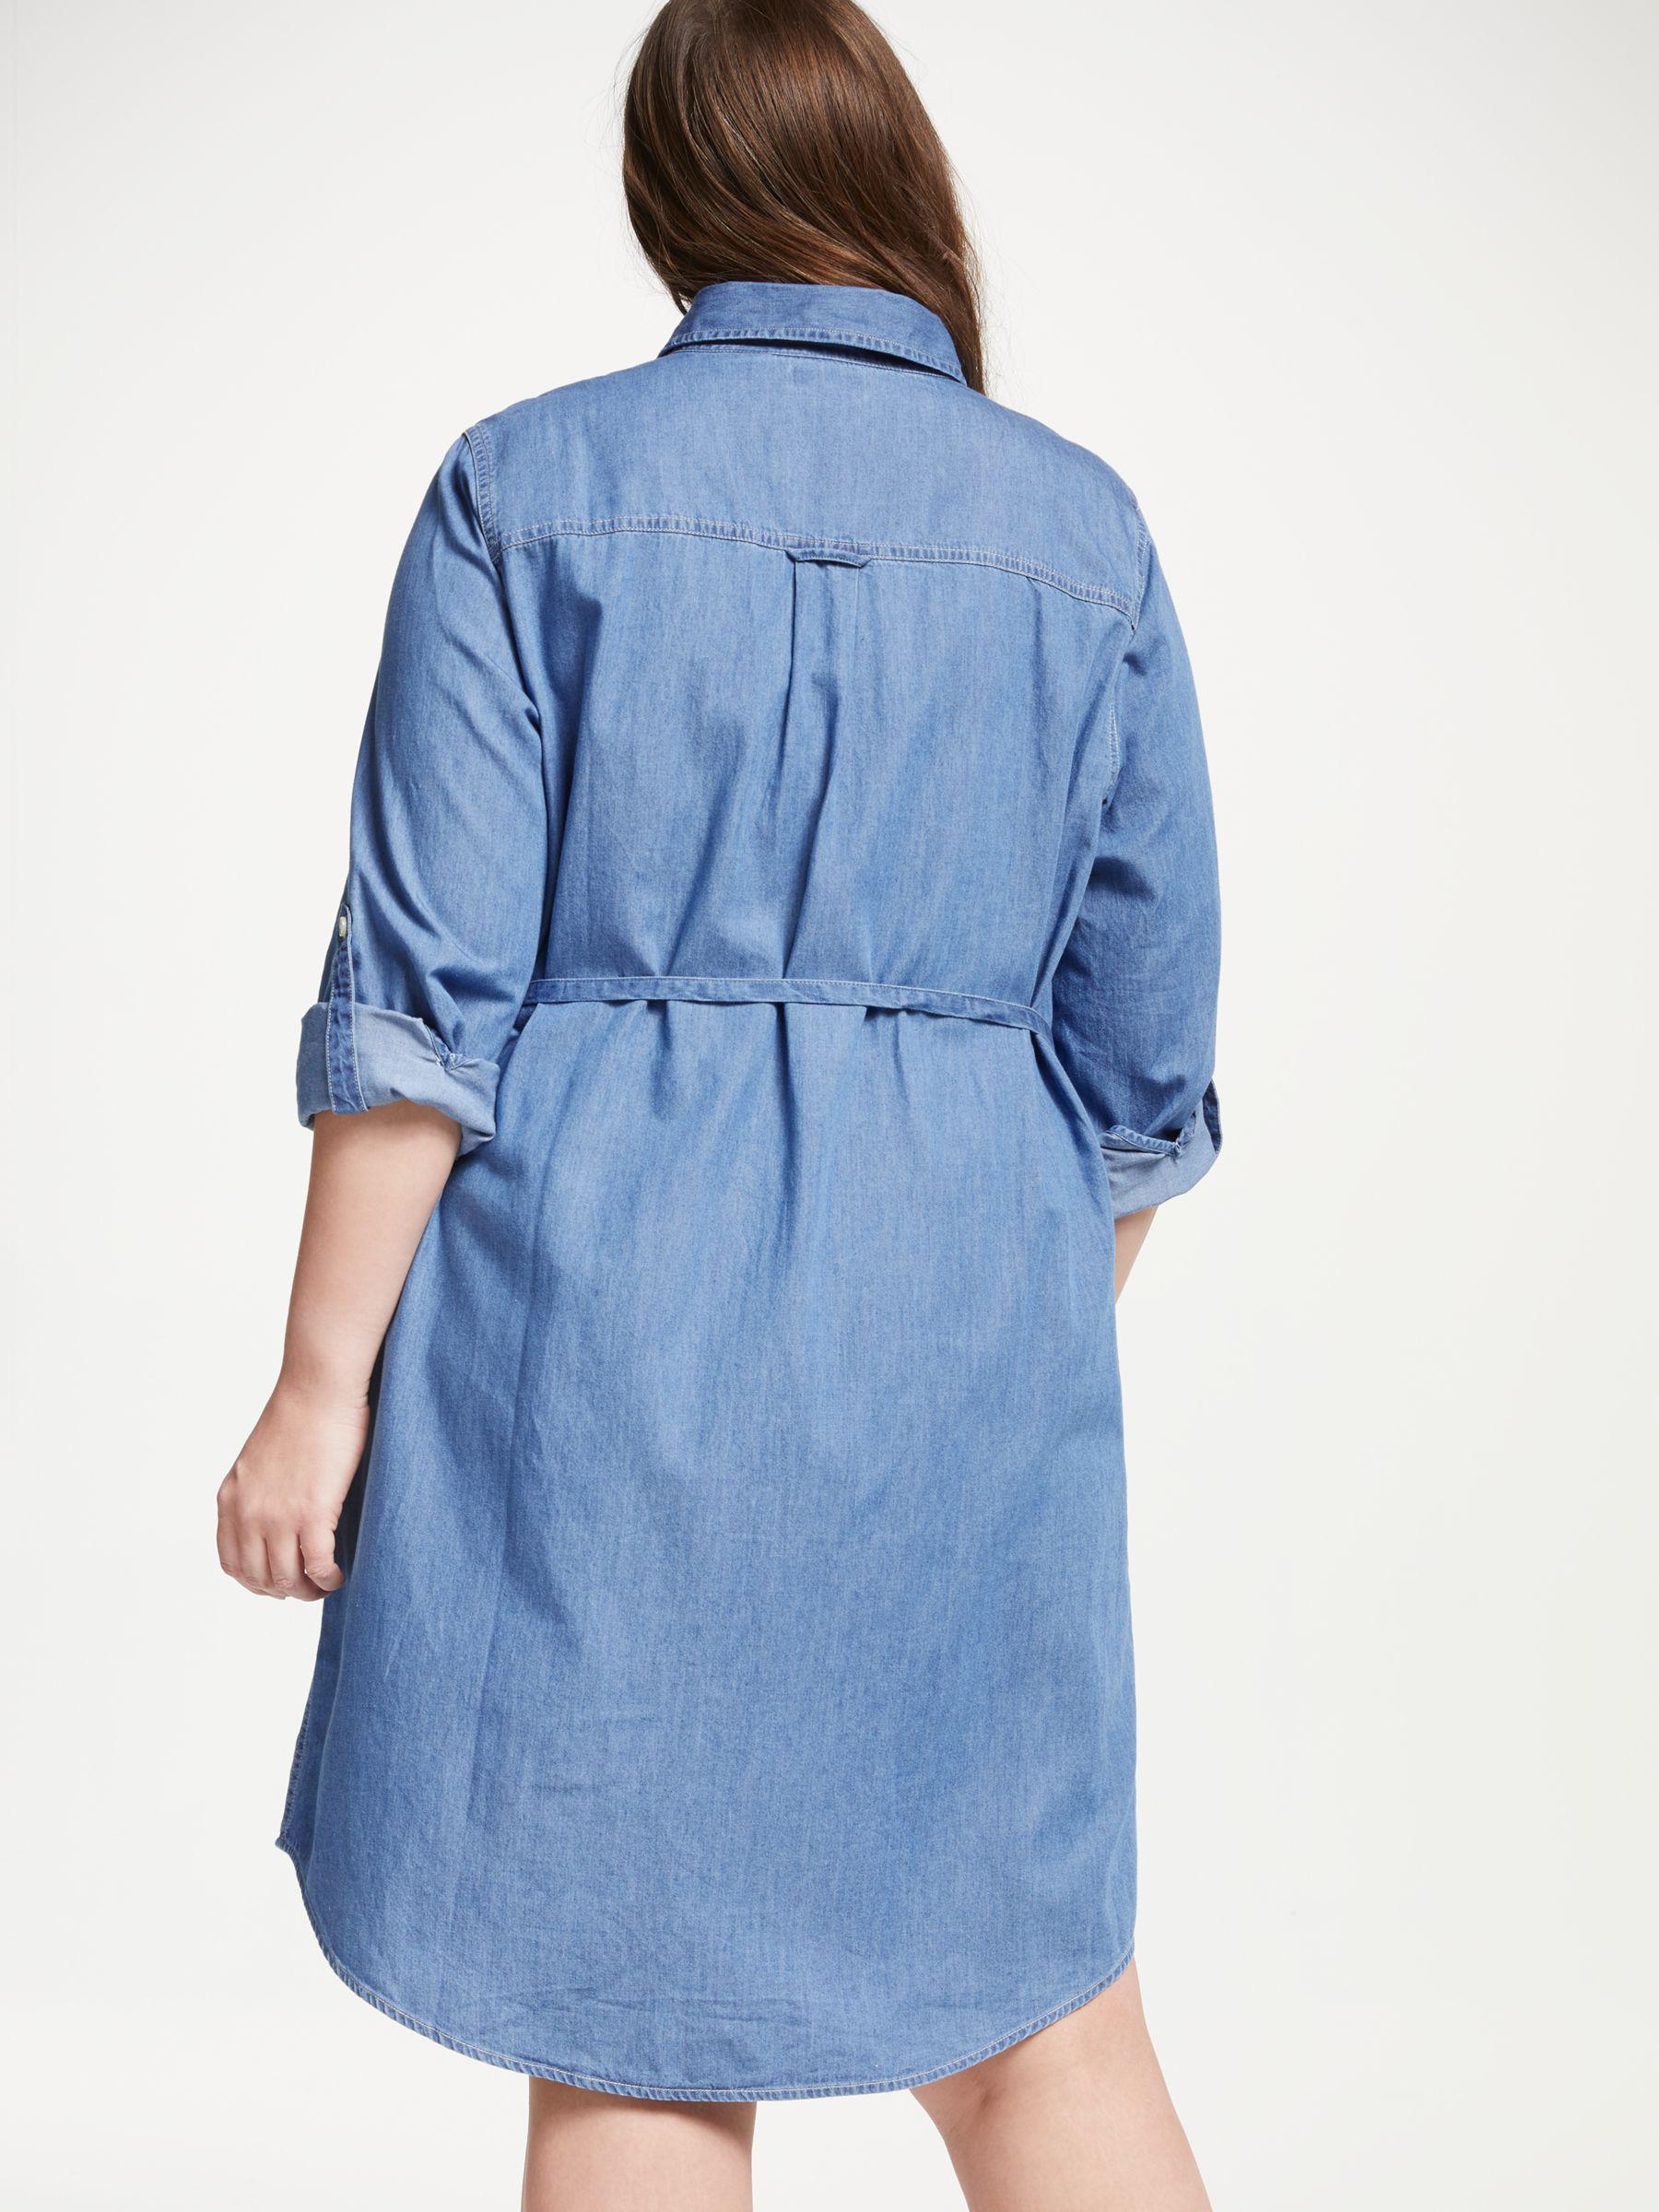 16daae5bf76 Levi s Plus Bebe Denim Dress in Blue - Lyst